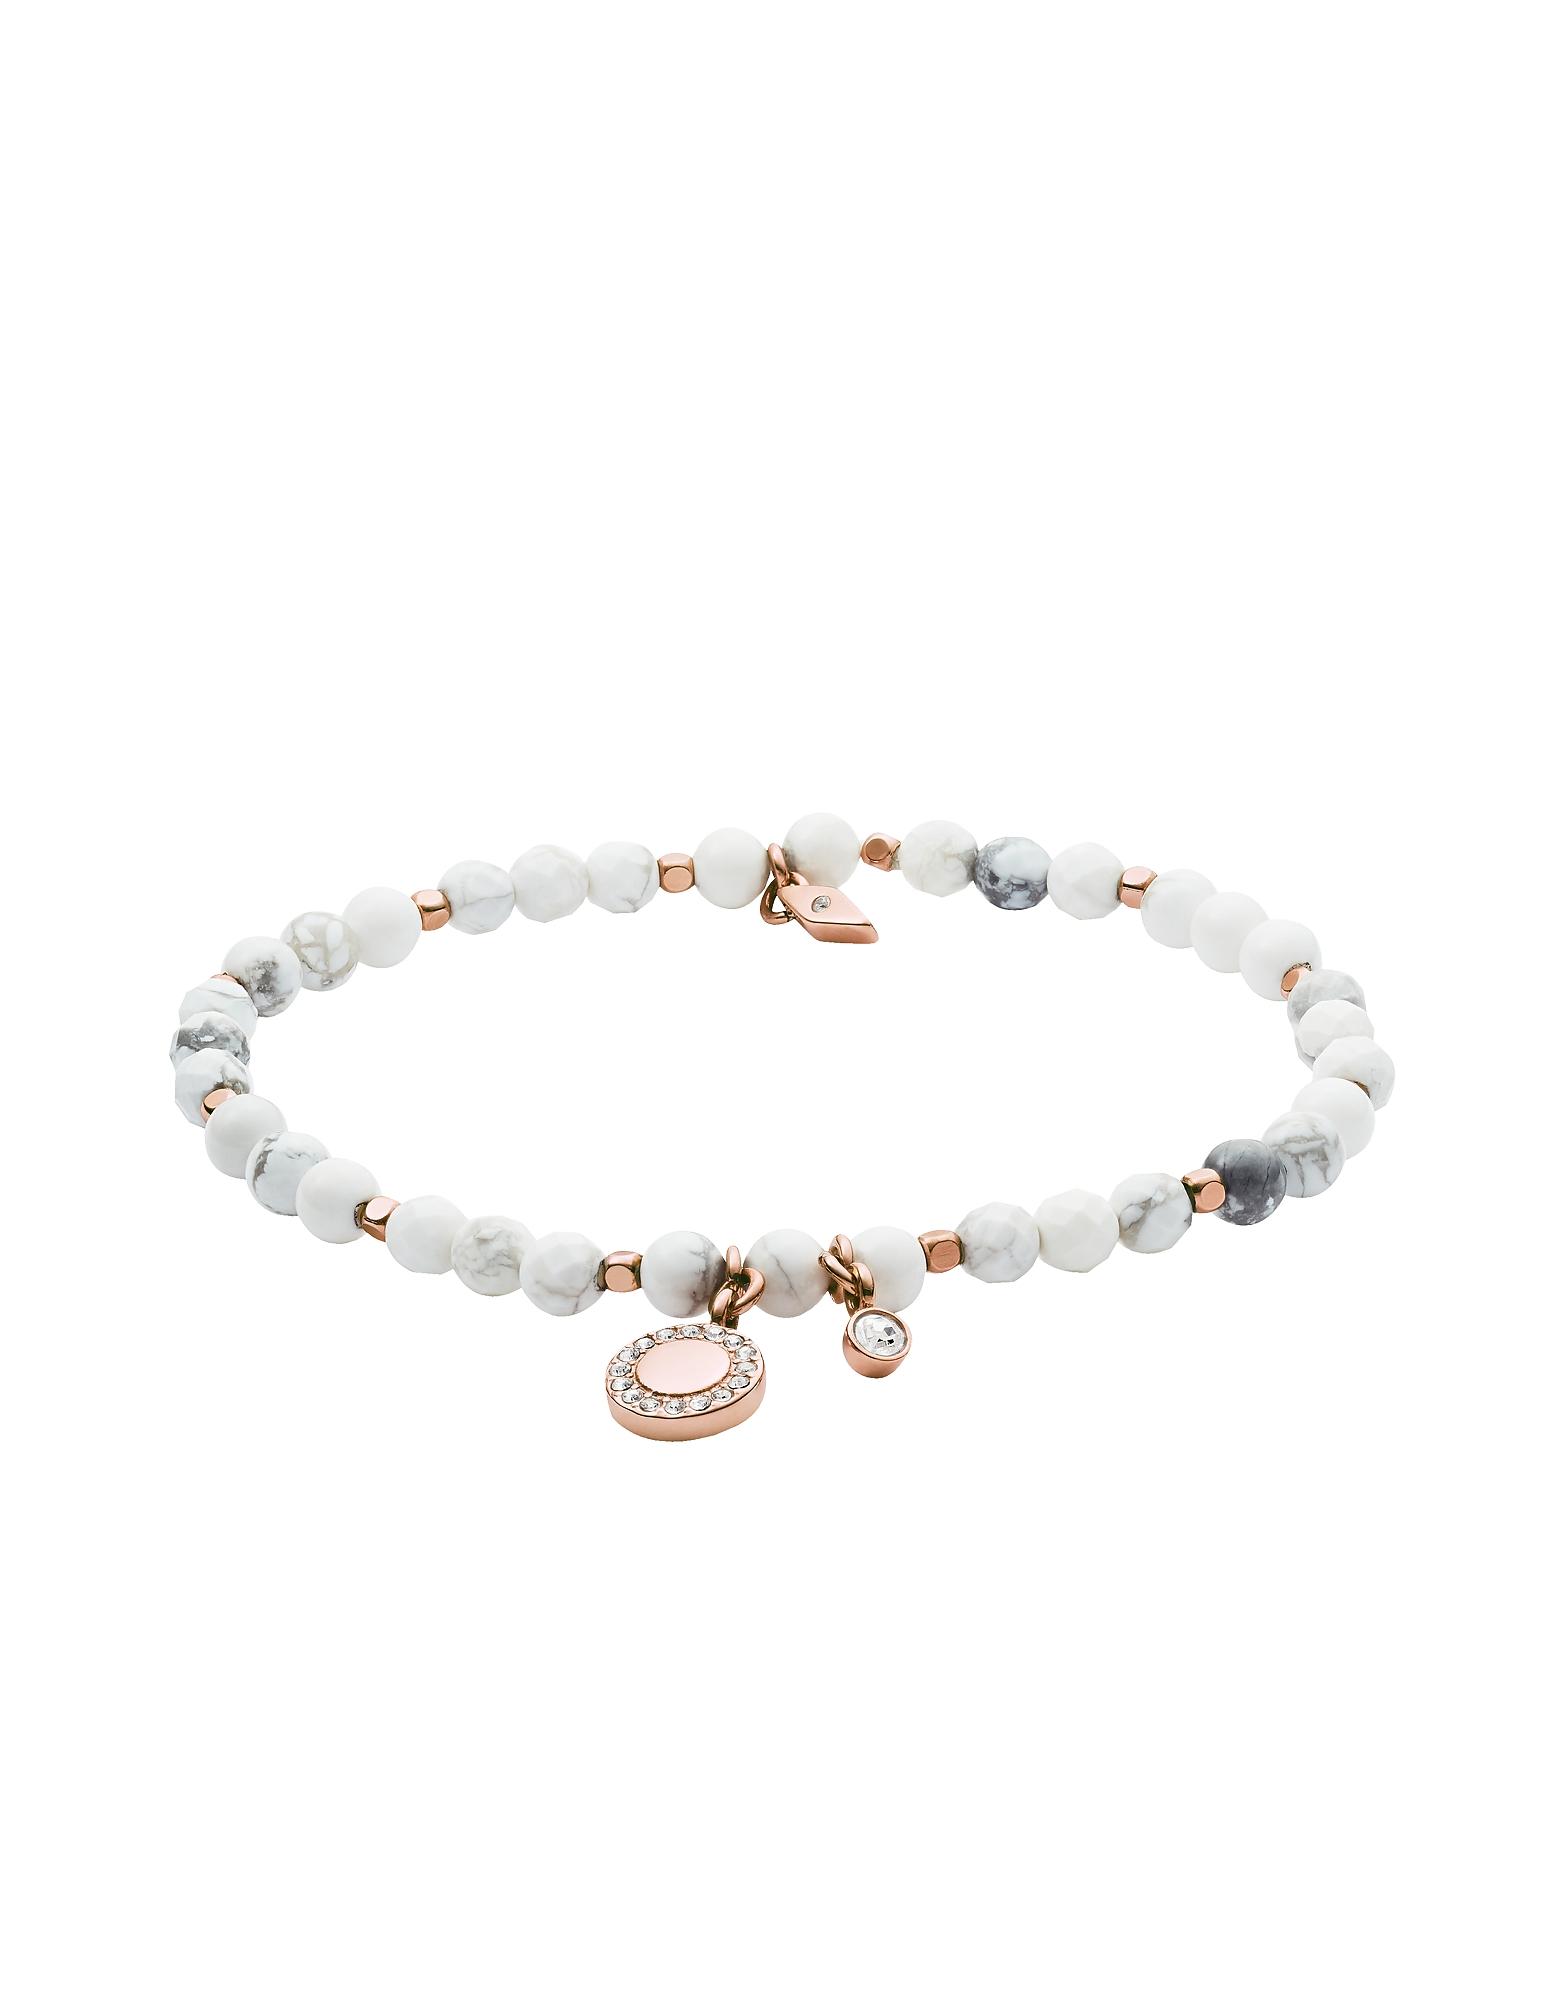 Fossil Bracelets, Women's Wellness White Semi-Precious Bracelet